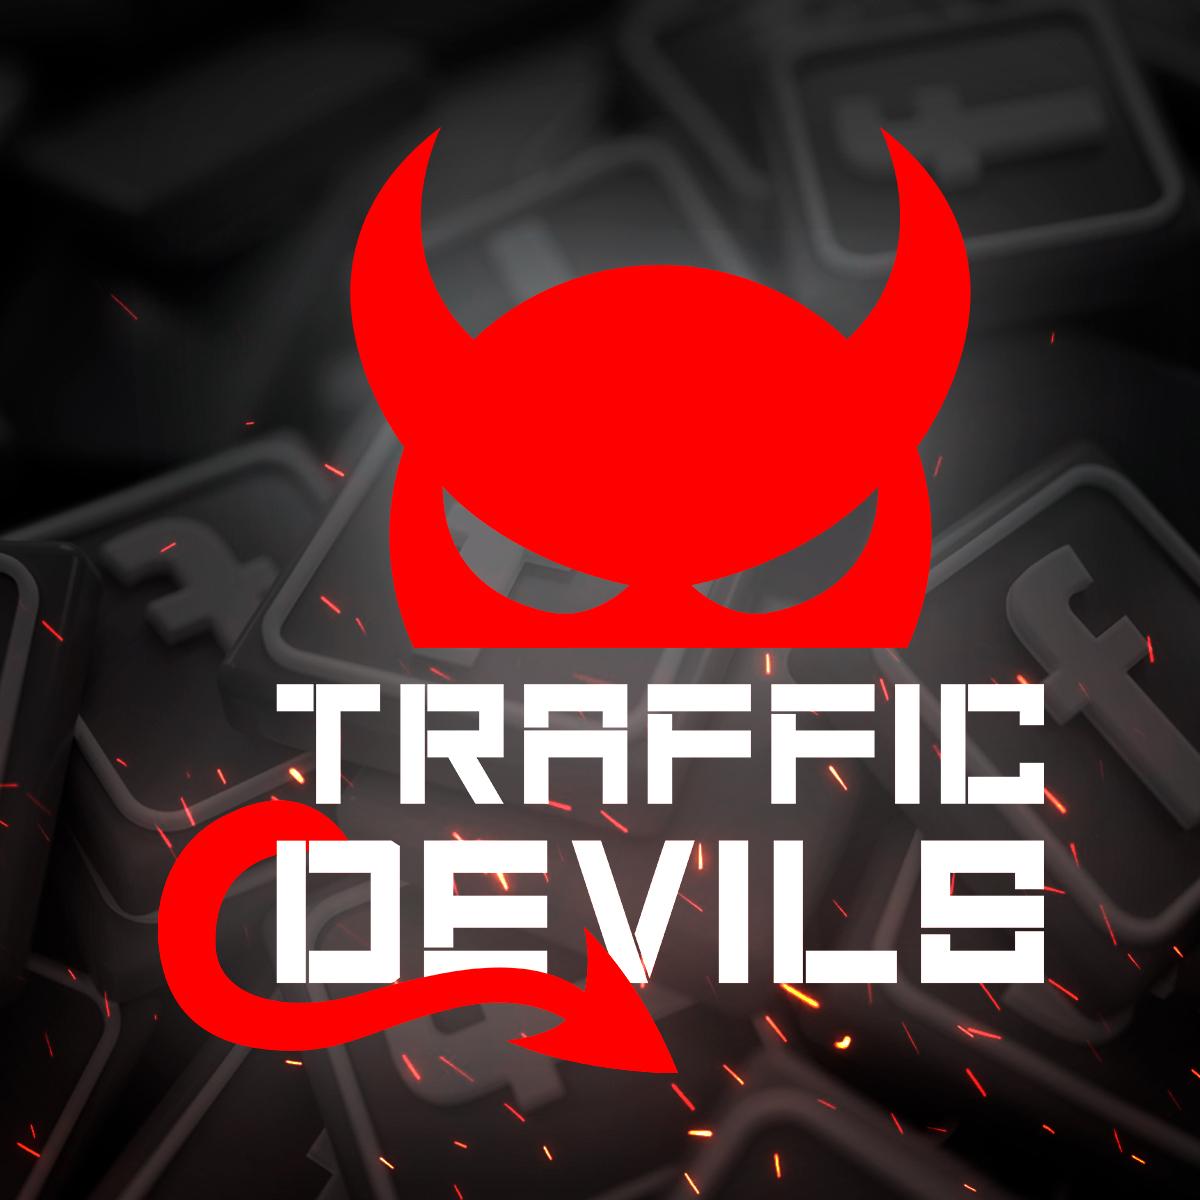 Traffic Devils